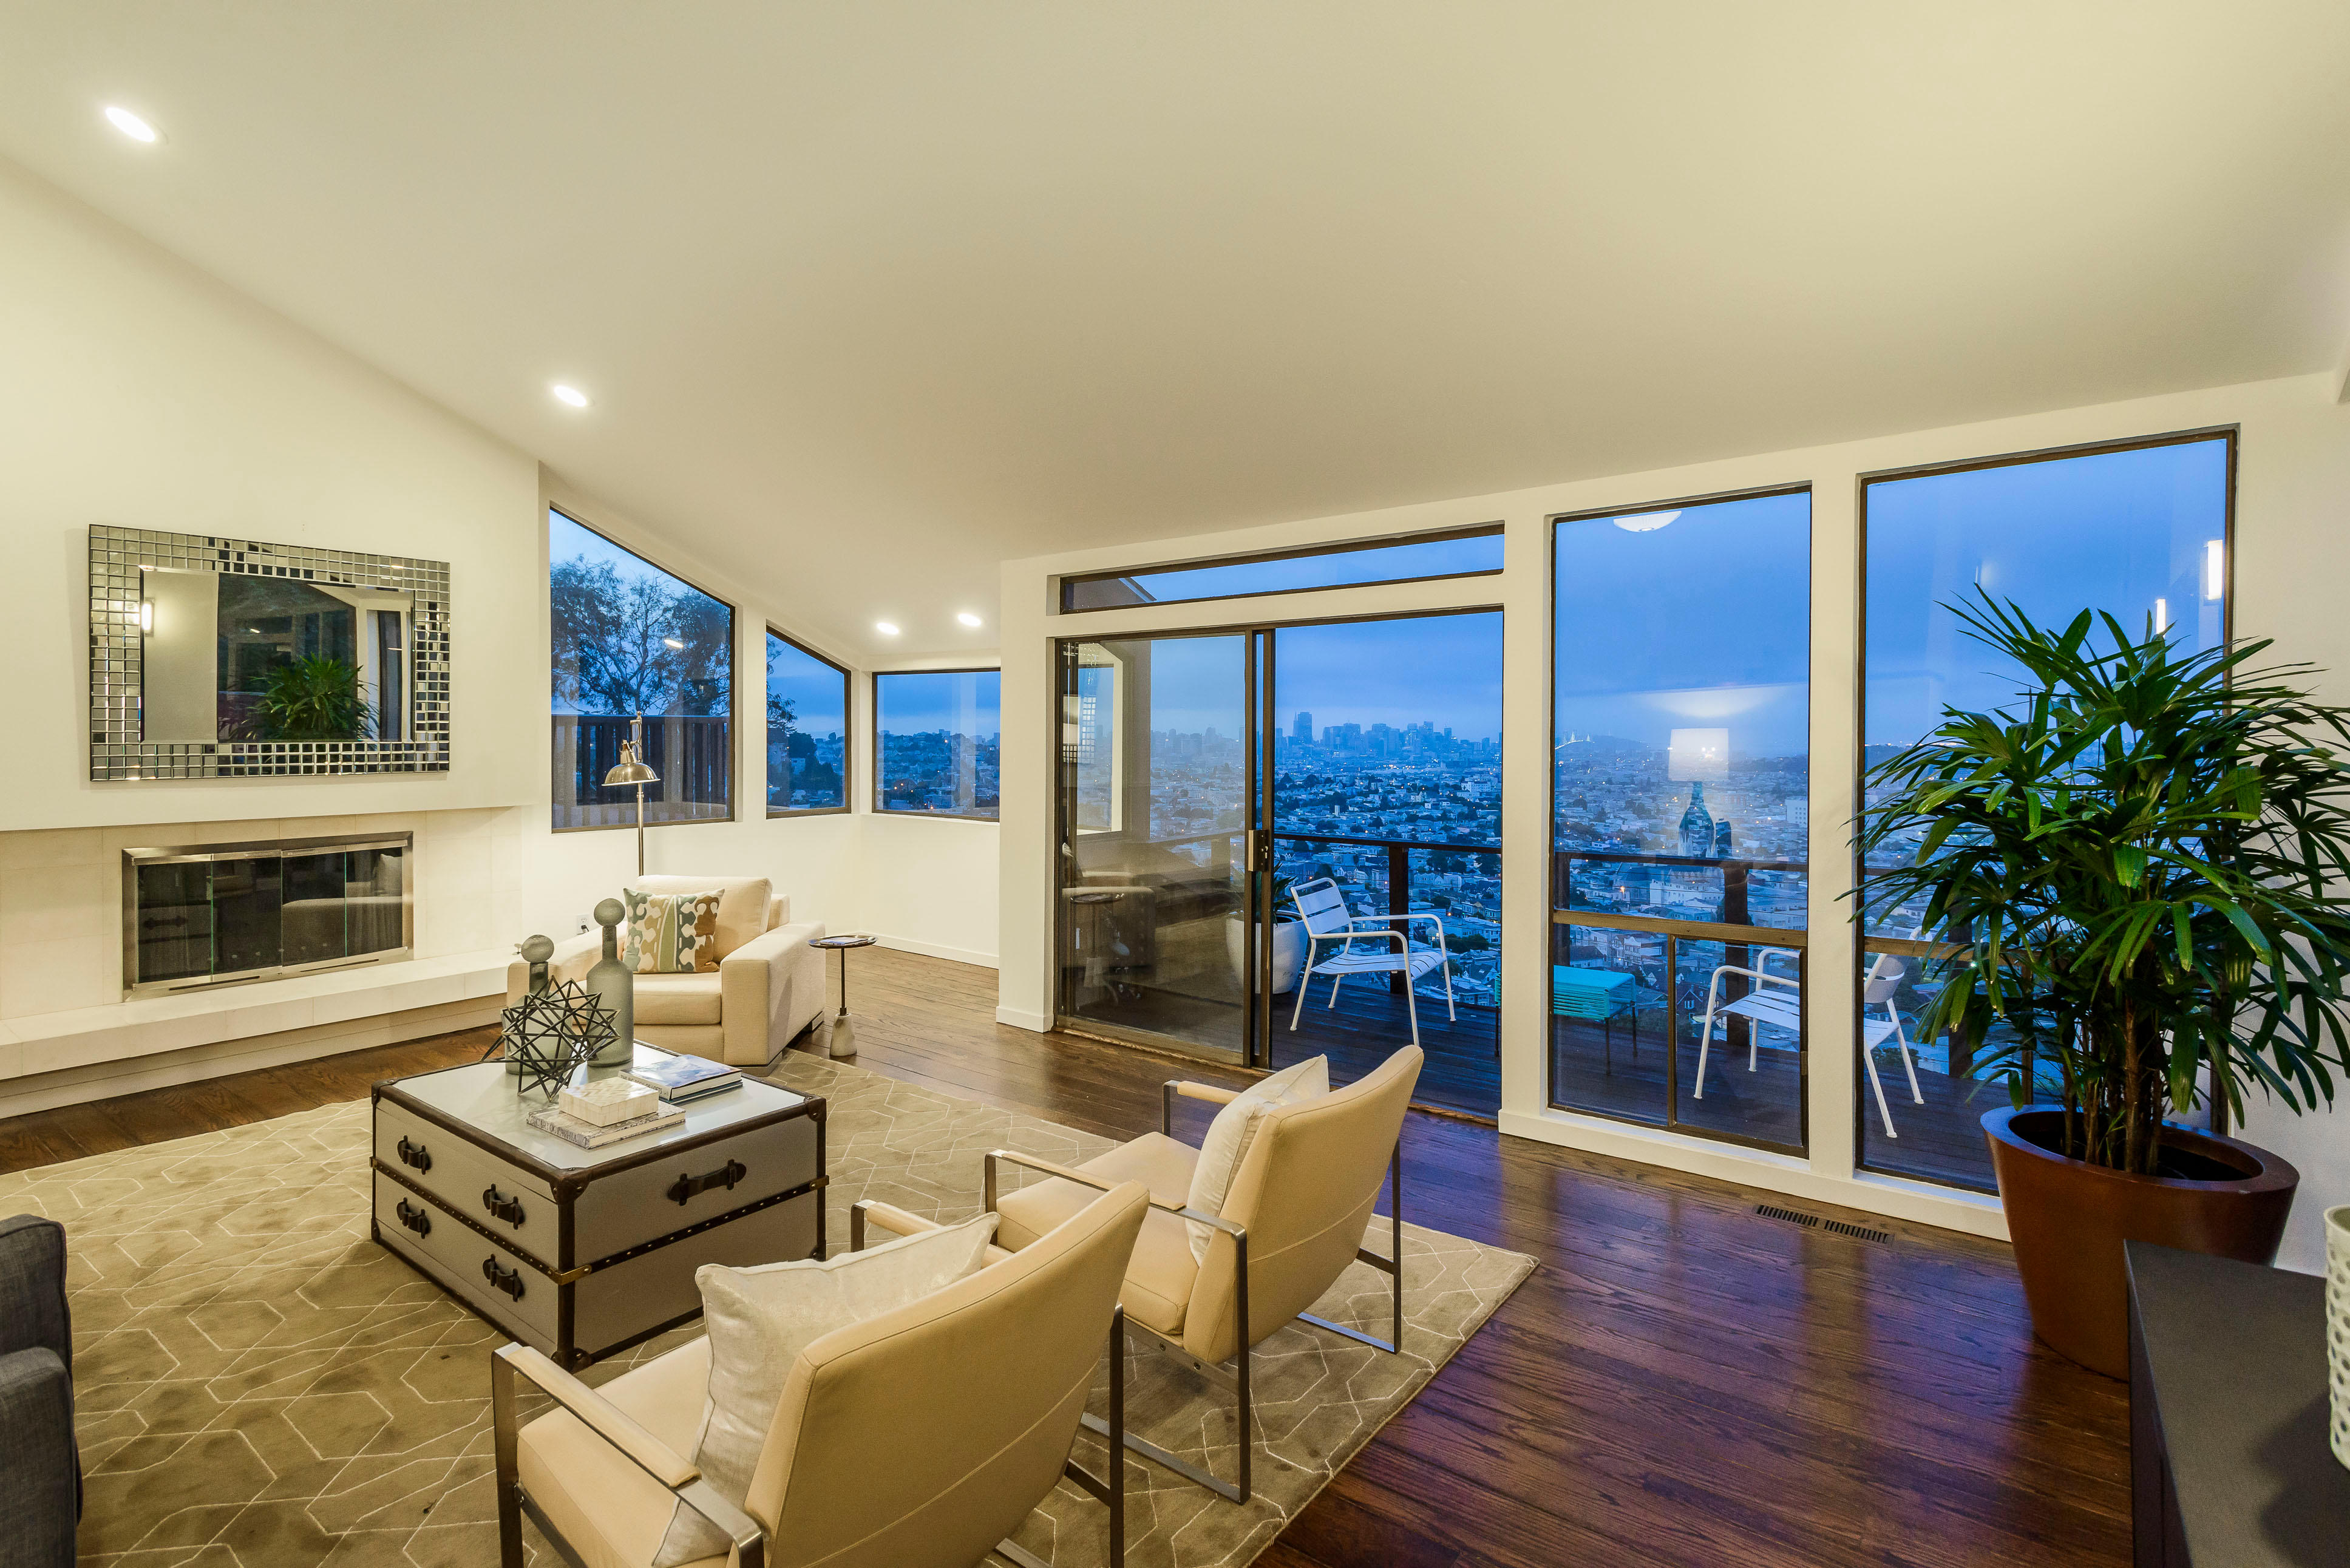 Robert R. Callan Jr. - McGuire Real Estate image 2